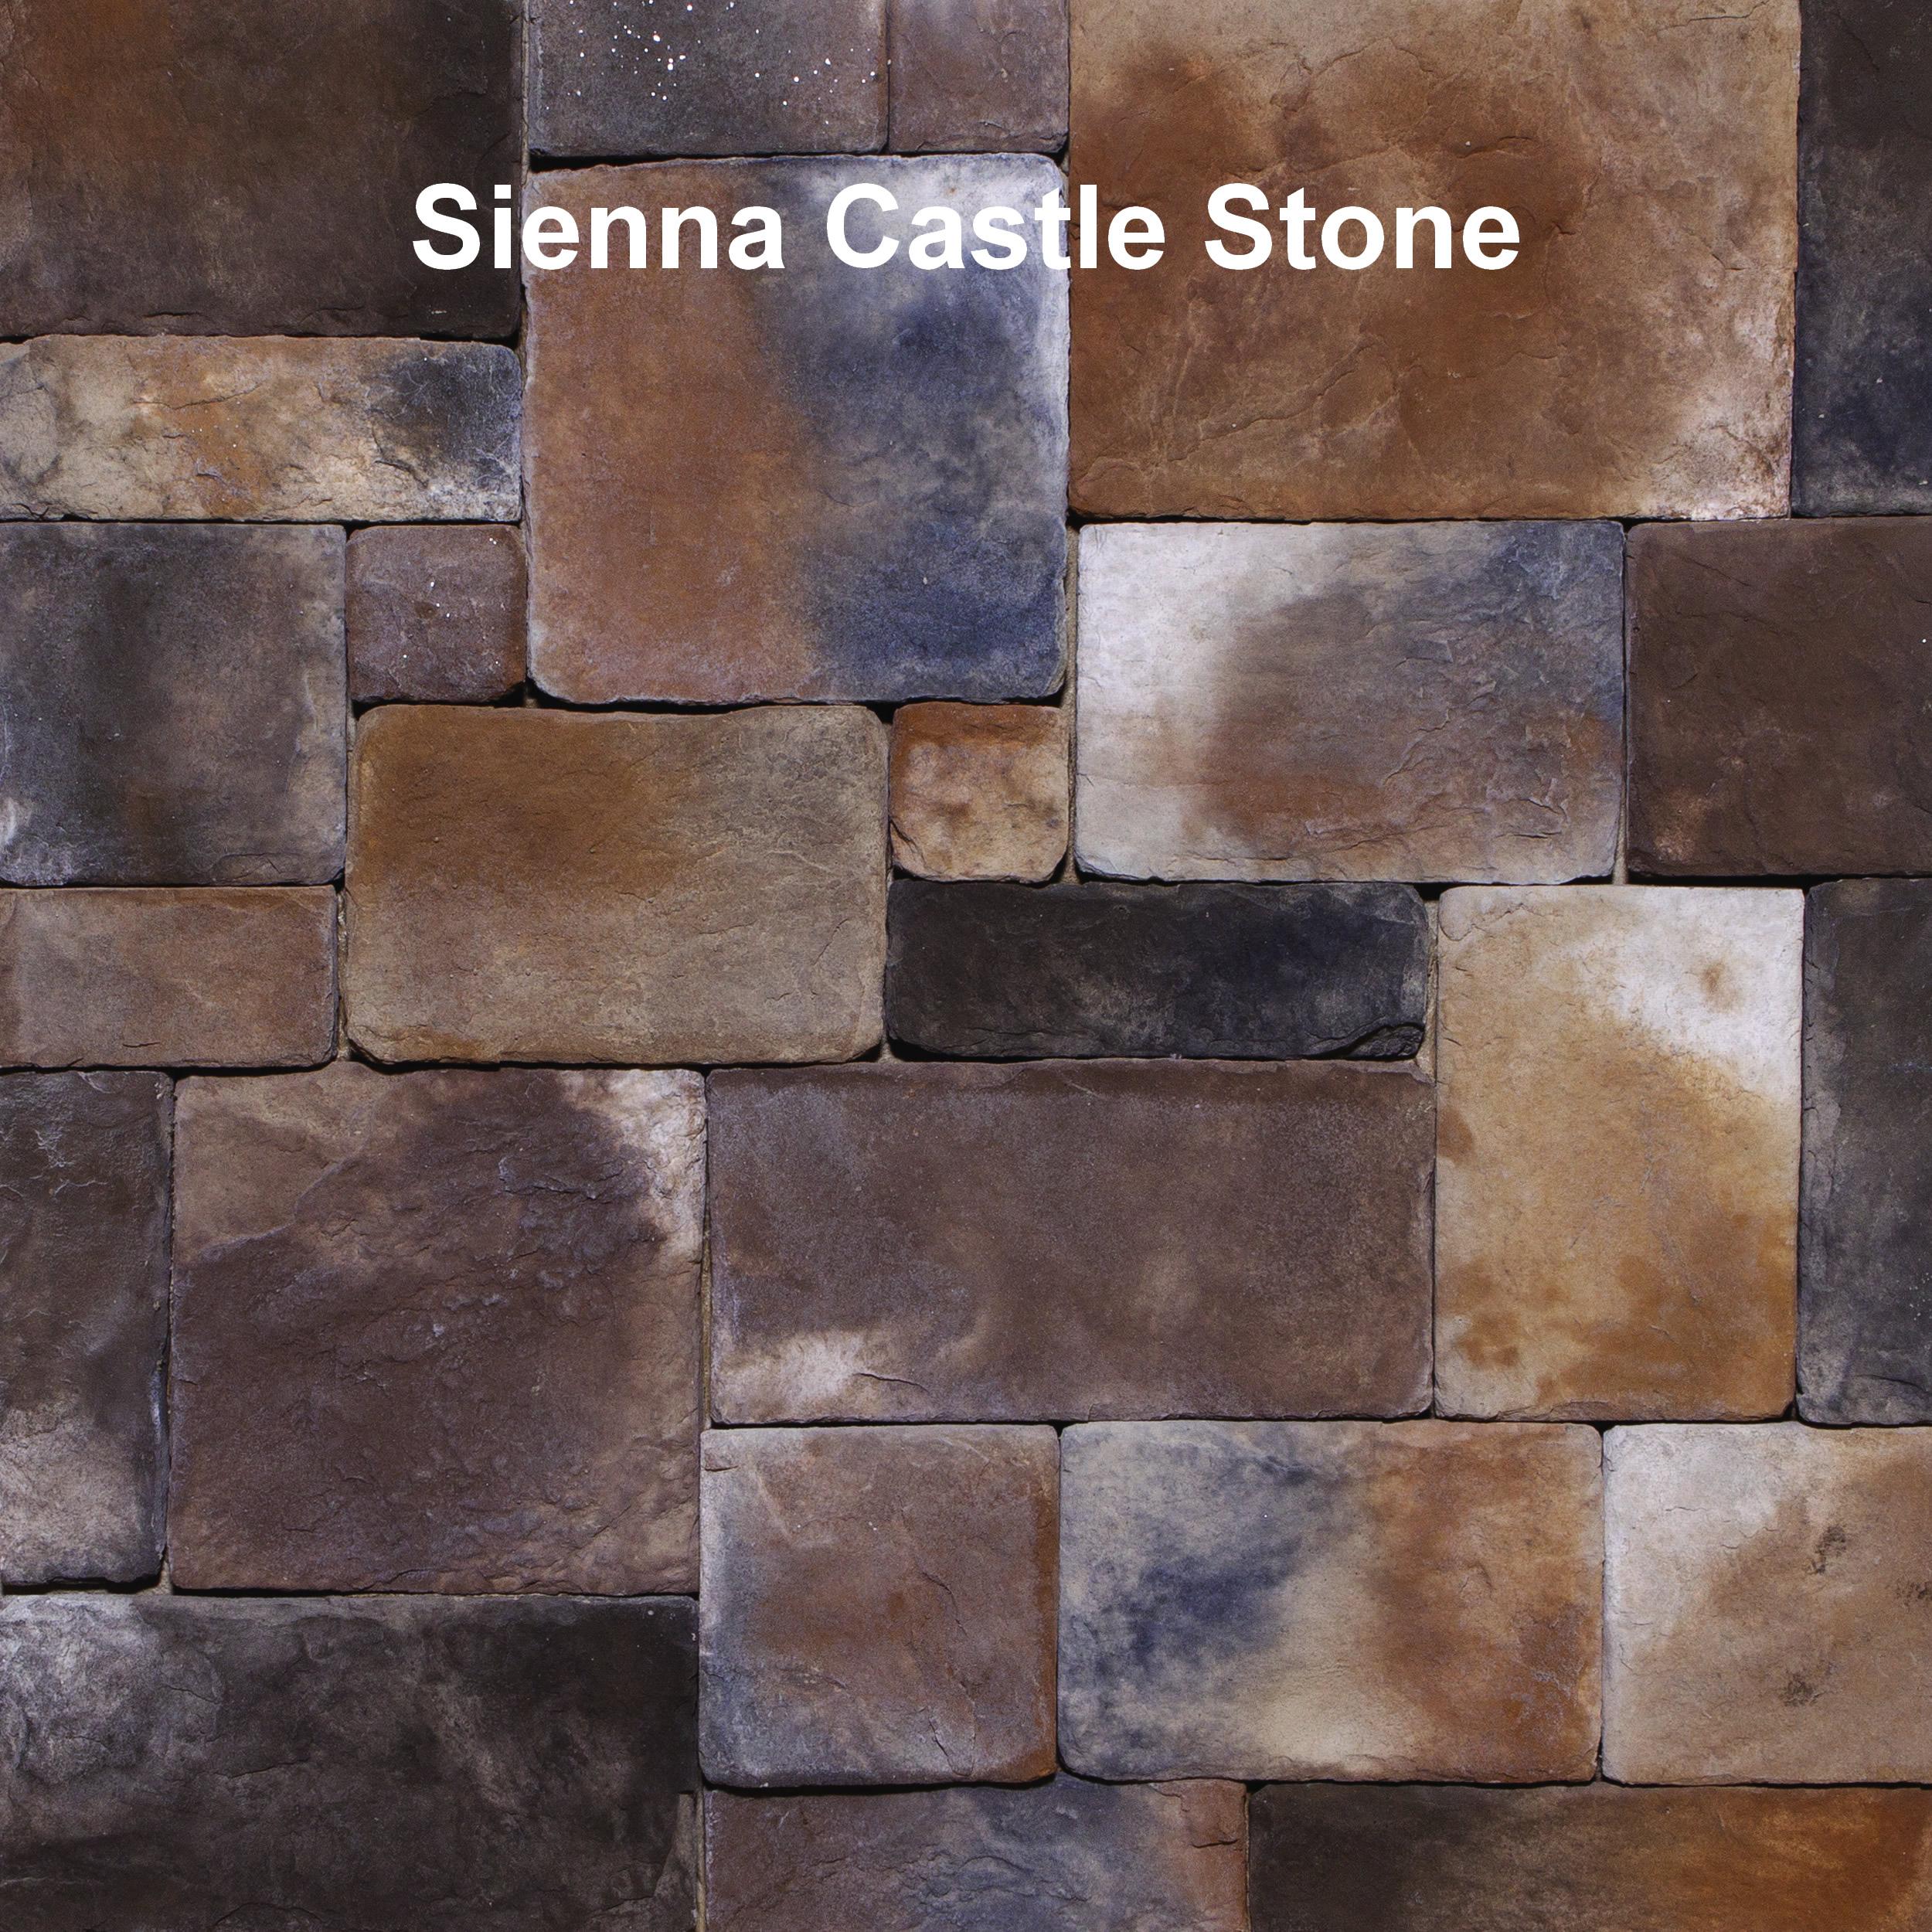 DQ_Castle Stone_Sienna_Profil.jpg